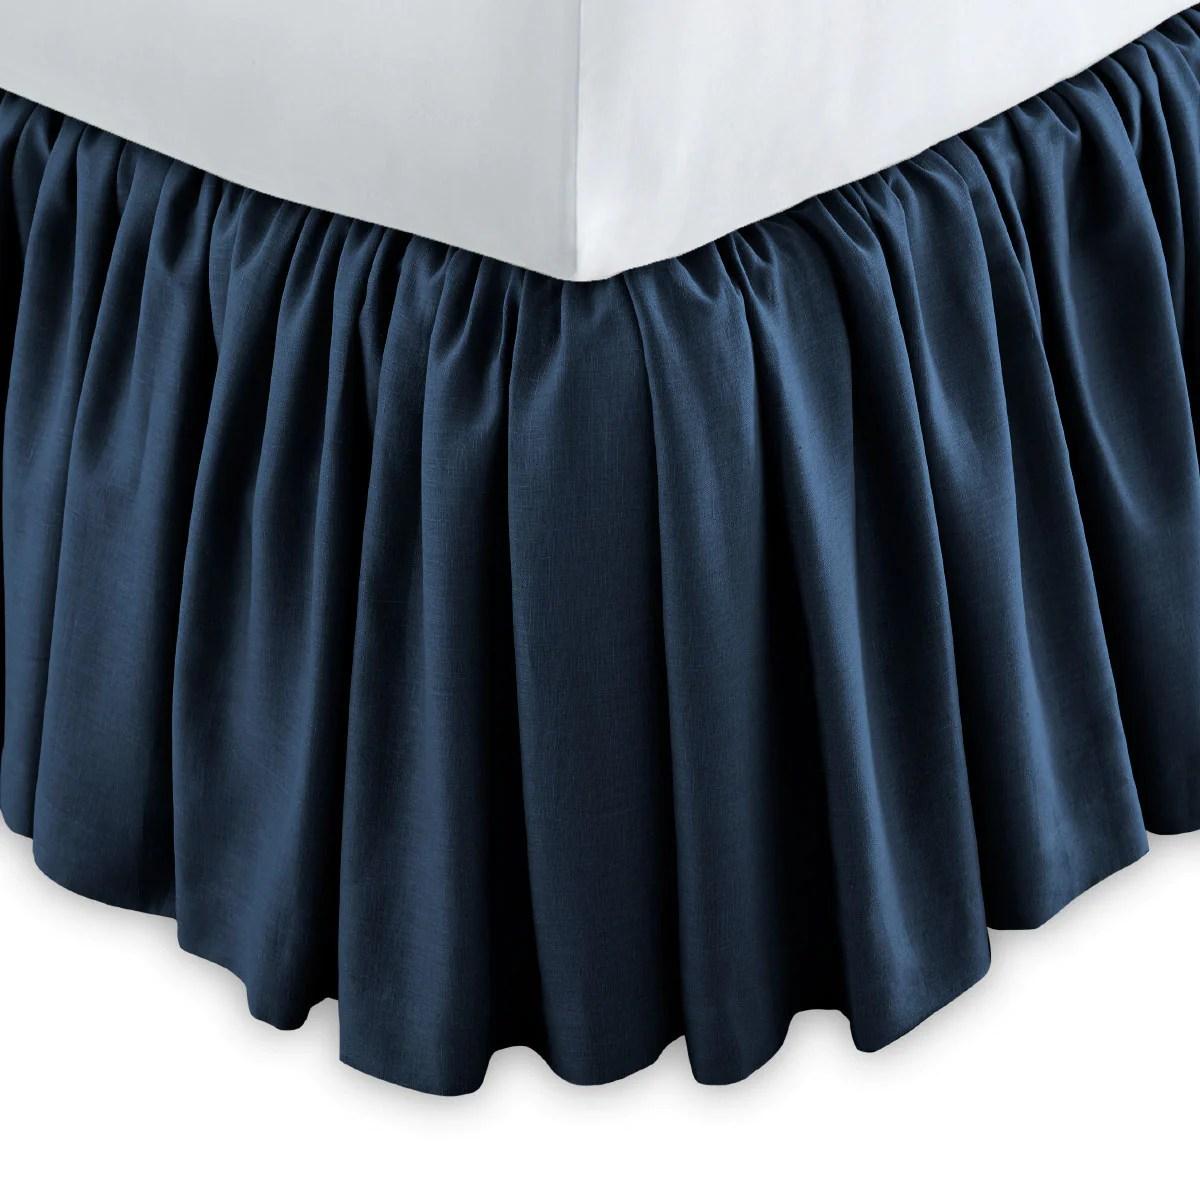 luxury navy blue bedding high end